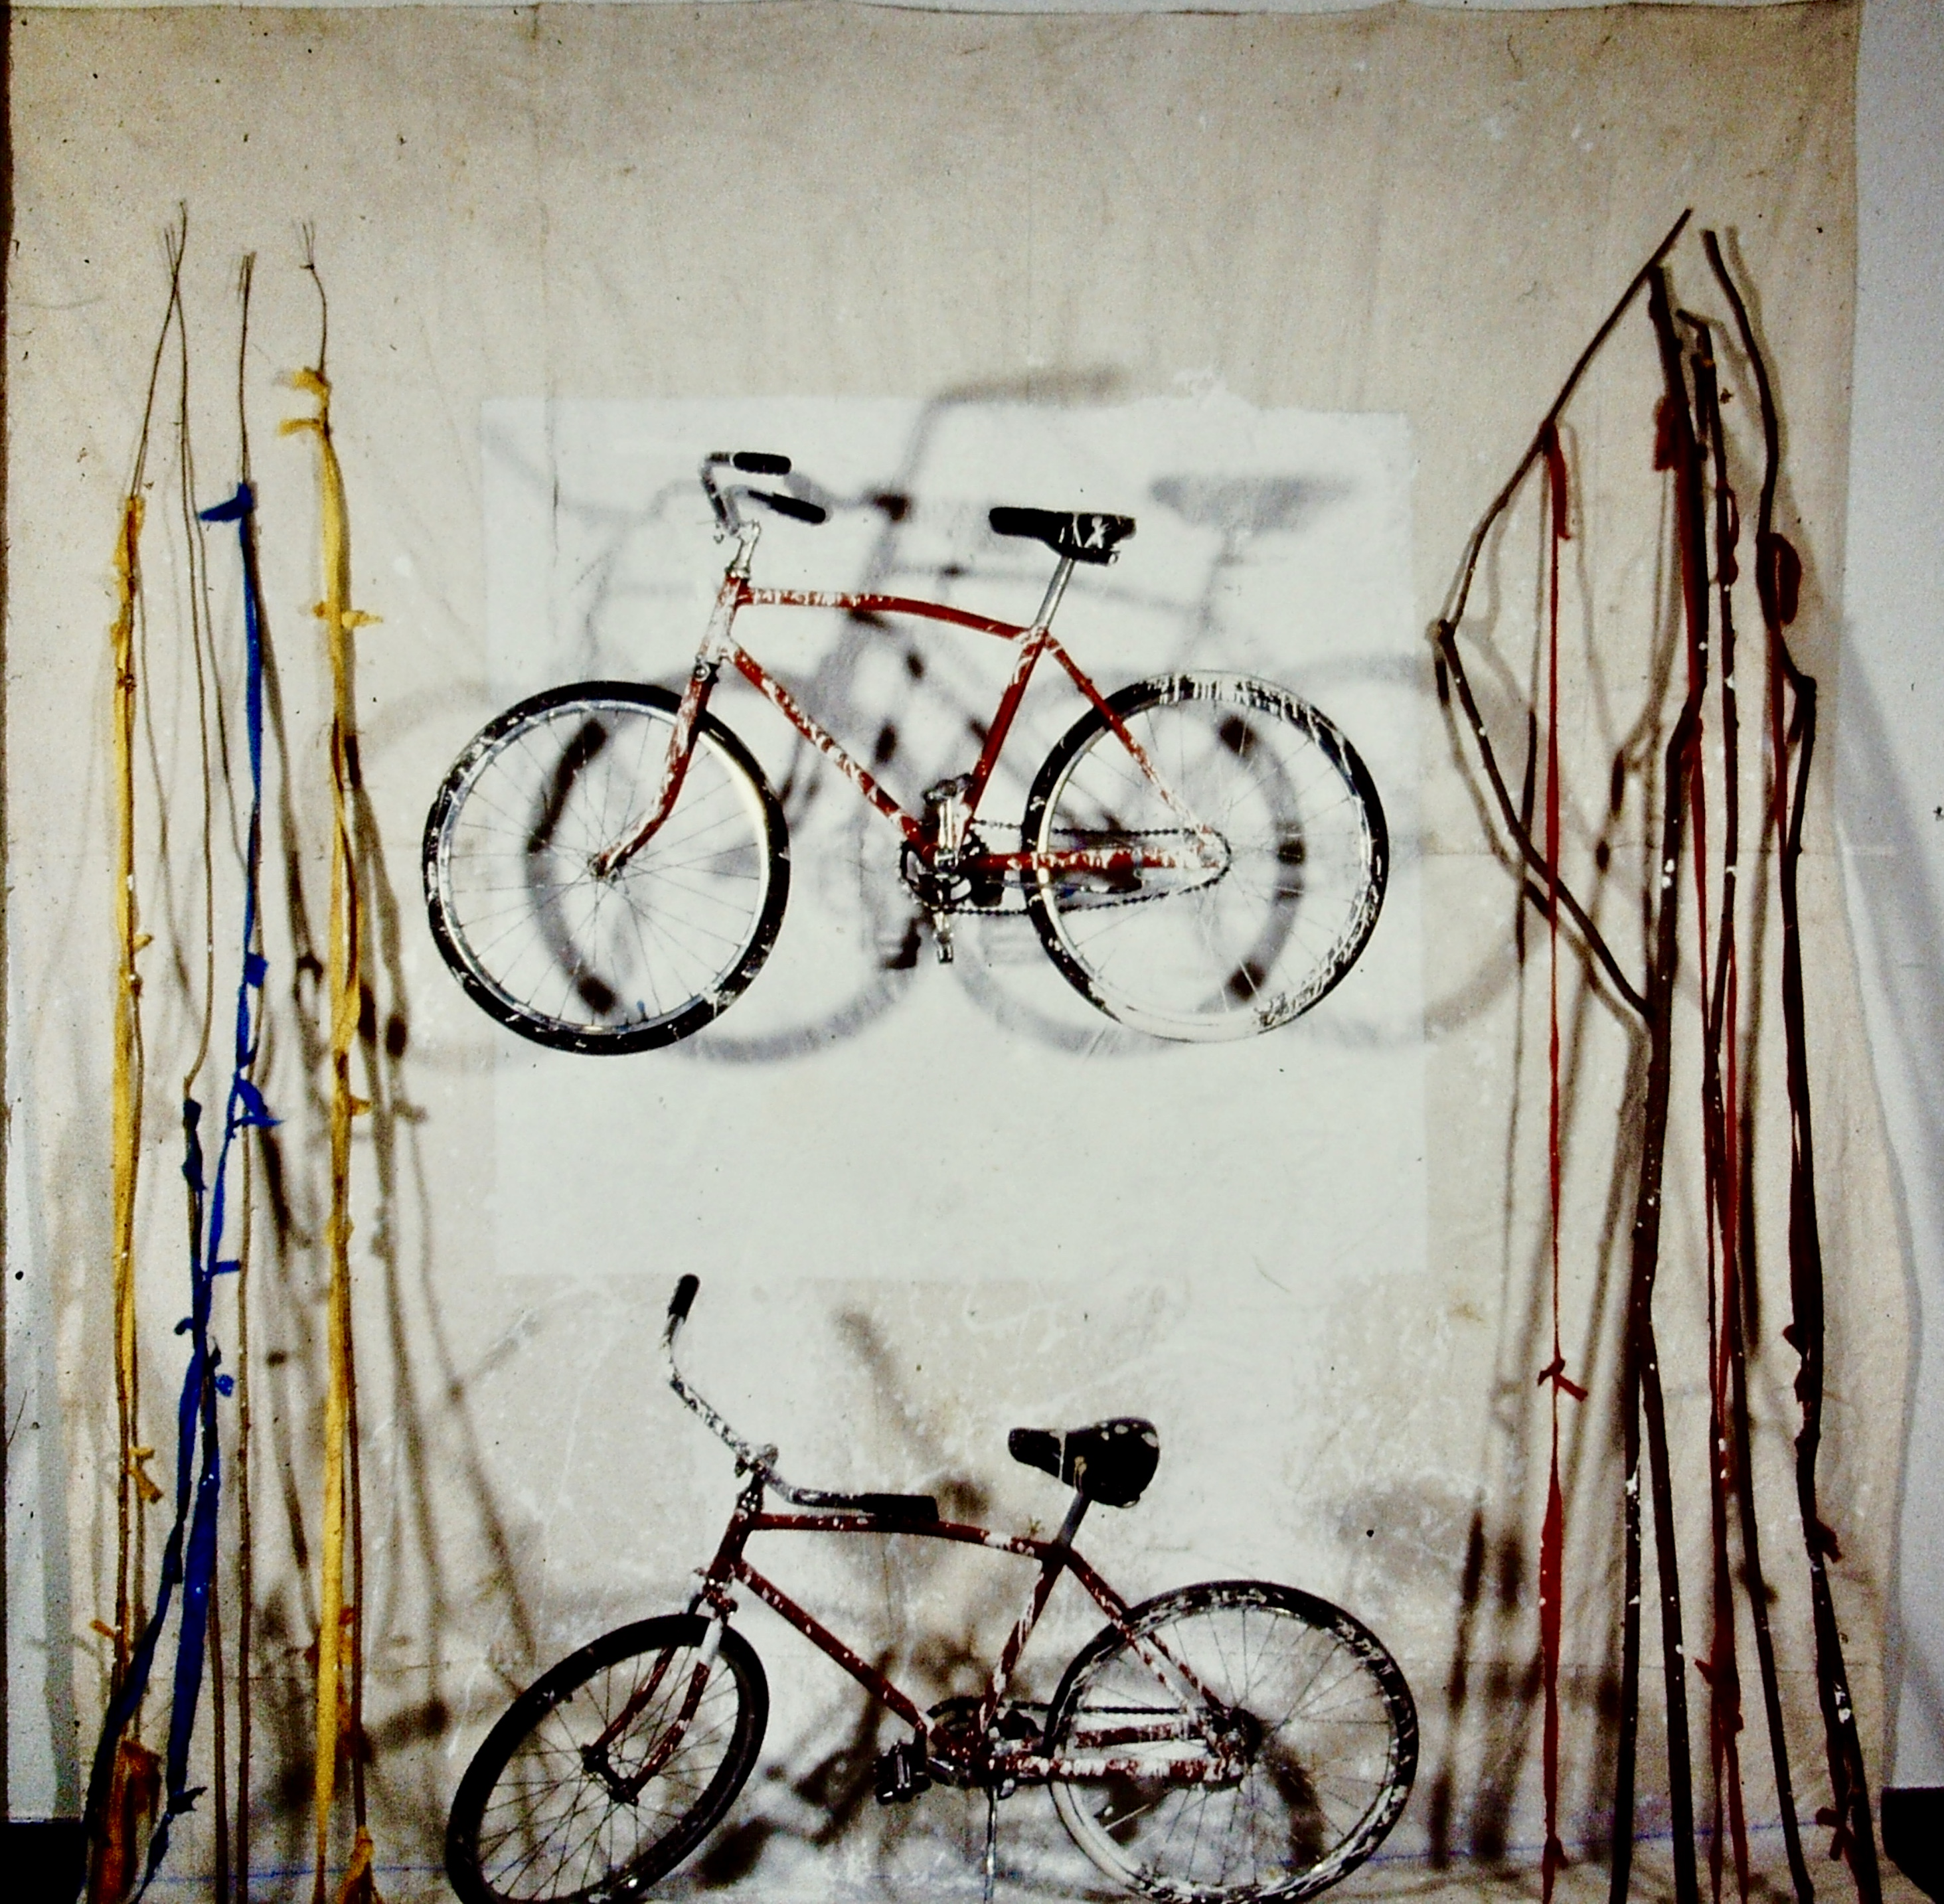 Kids' Bikes (detail)